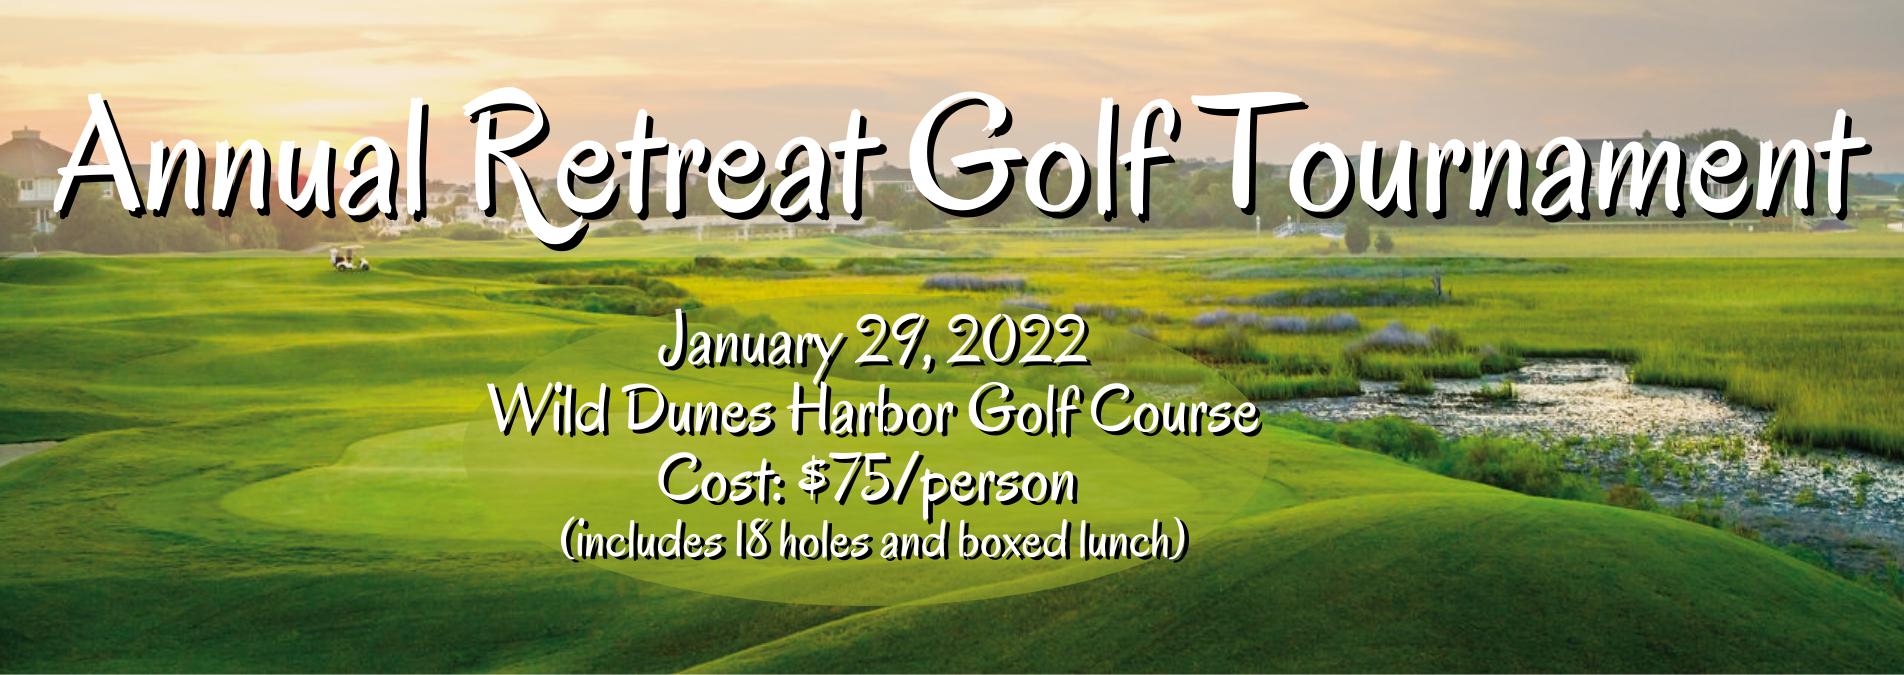 Wild Dunes Harbor Golf Course